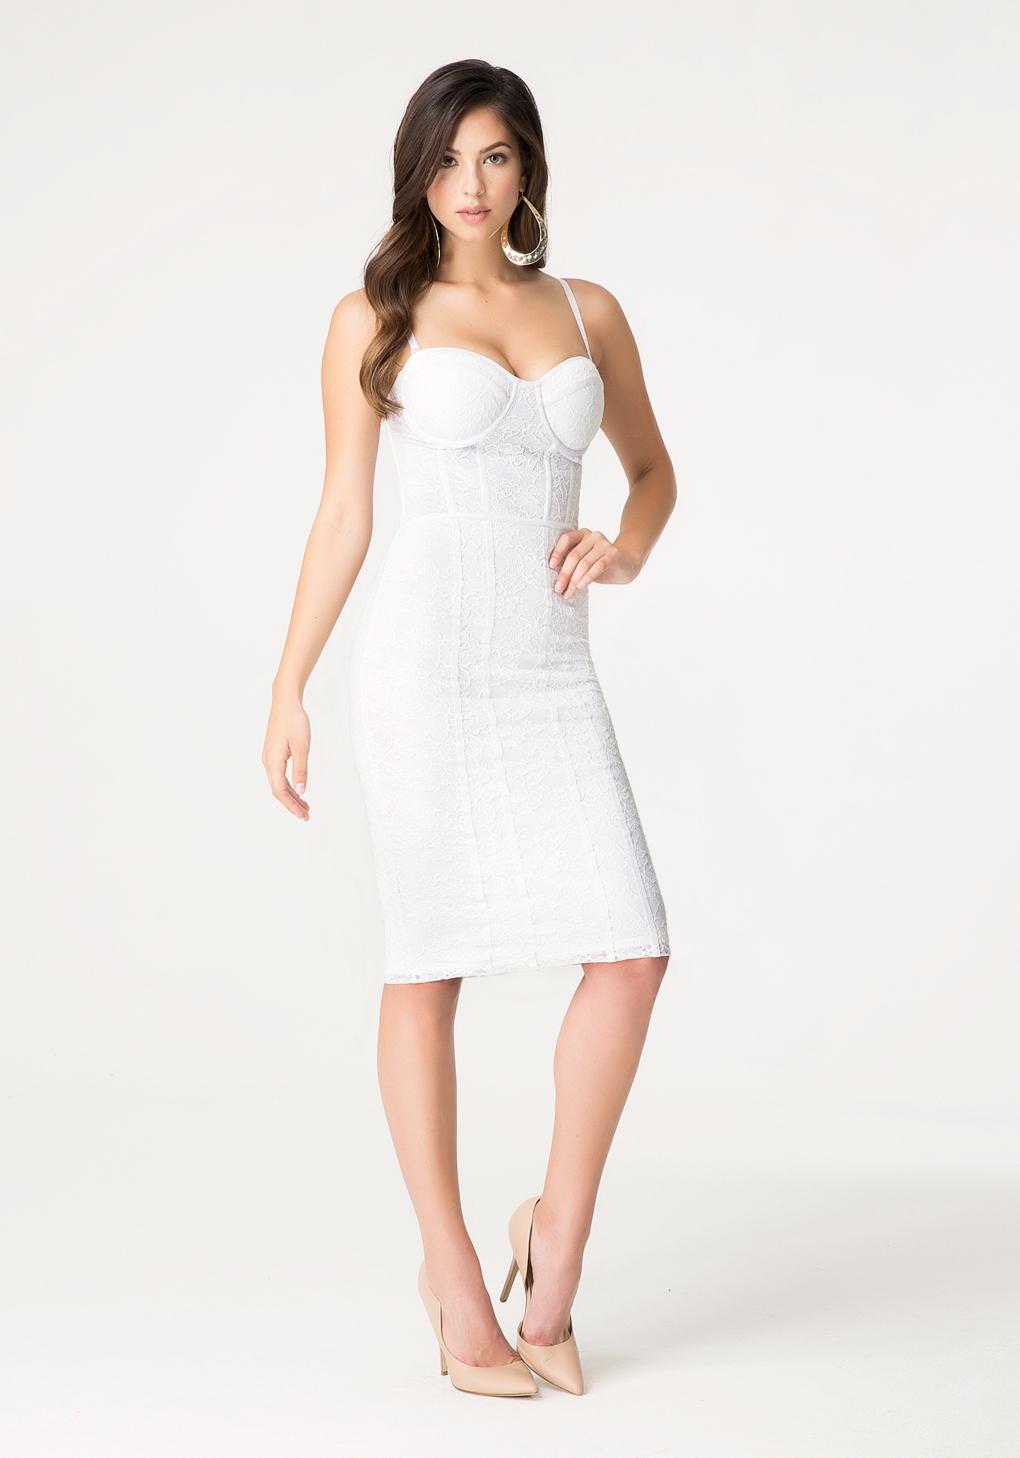 lyst bebe petite hook eye dress in white. Black Bedroom Furniture Sets. Home Design Ideas